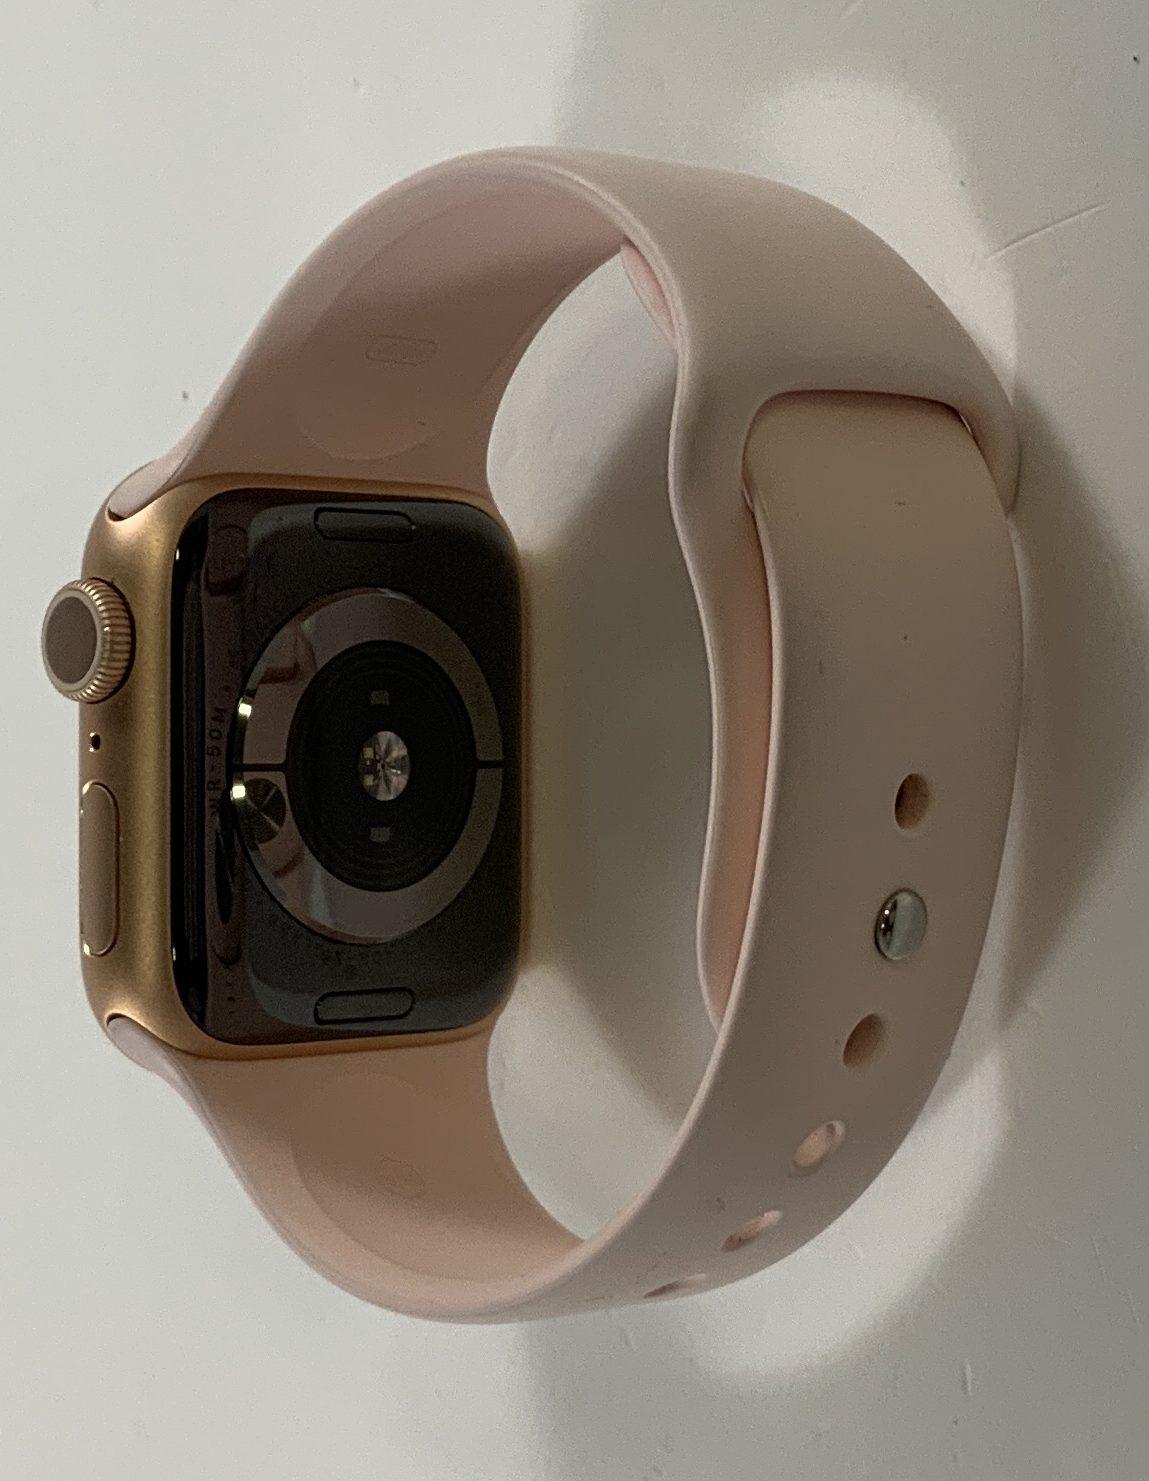 Watch Series 5 Aluminum Cellular (40mm), Gold, Afbeelding 2